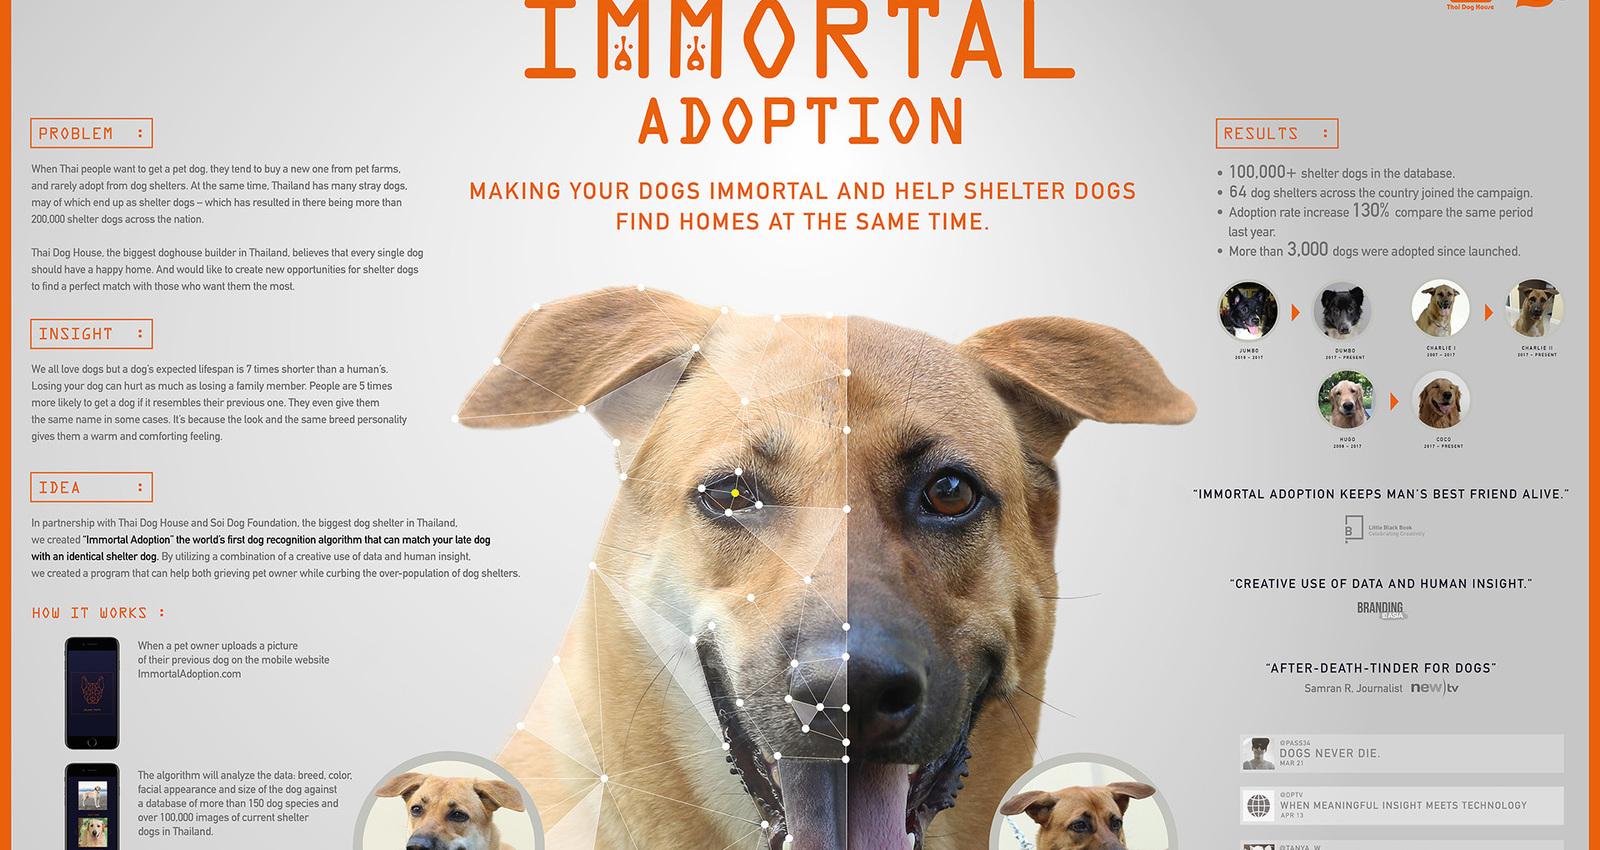 Immortal Adoption